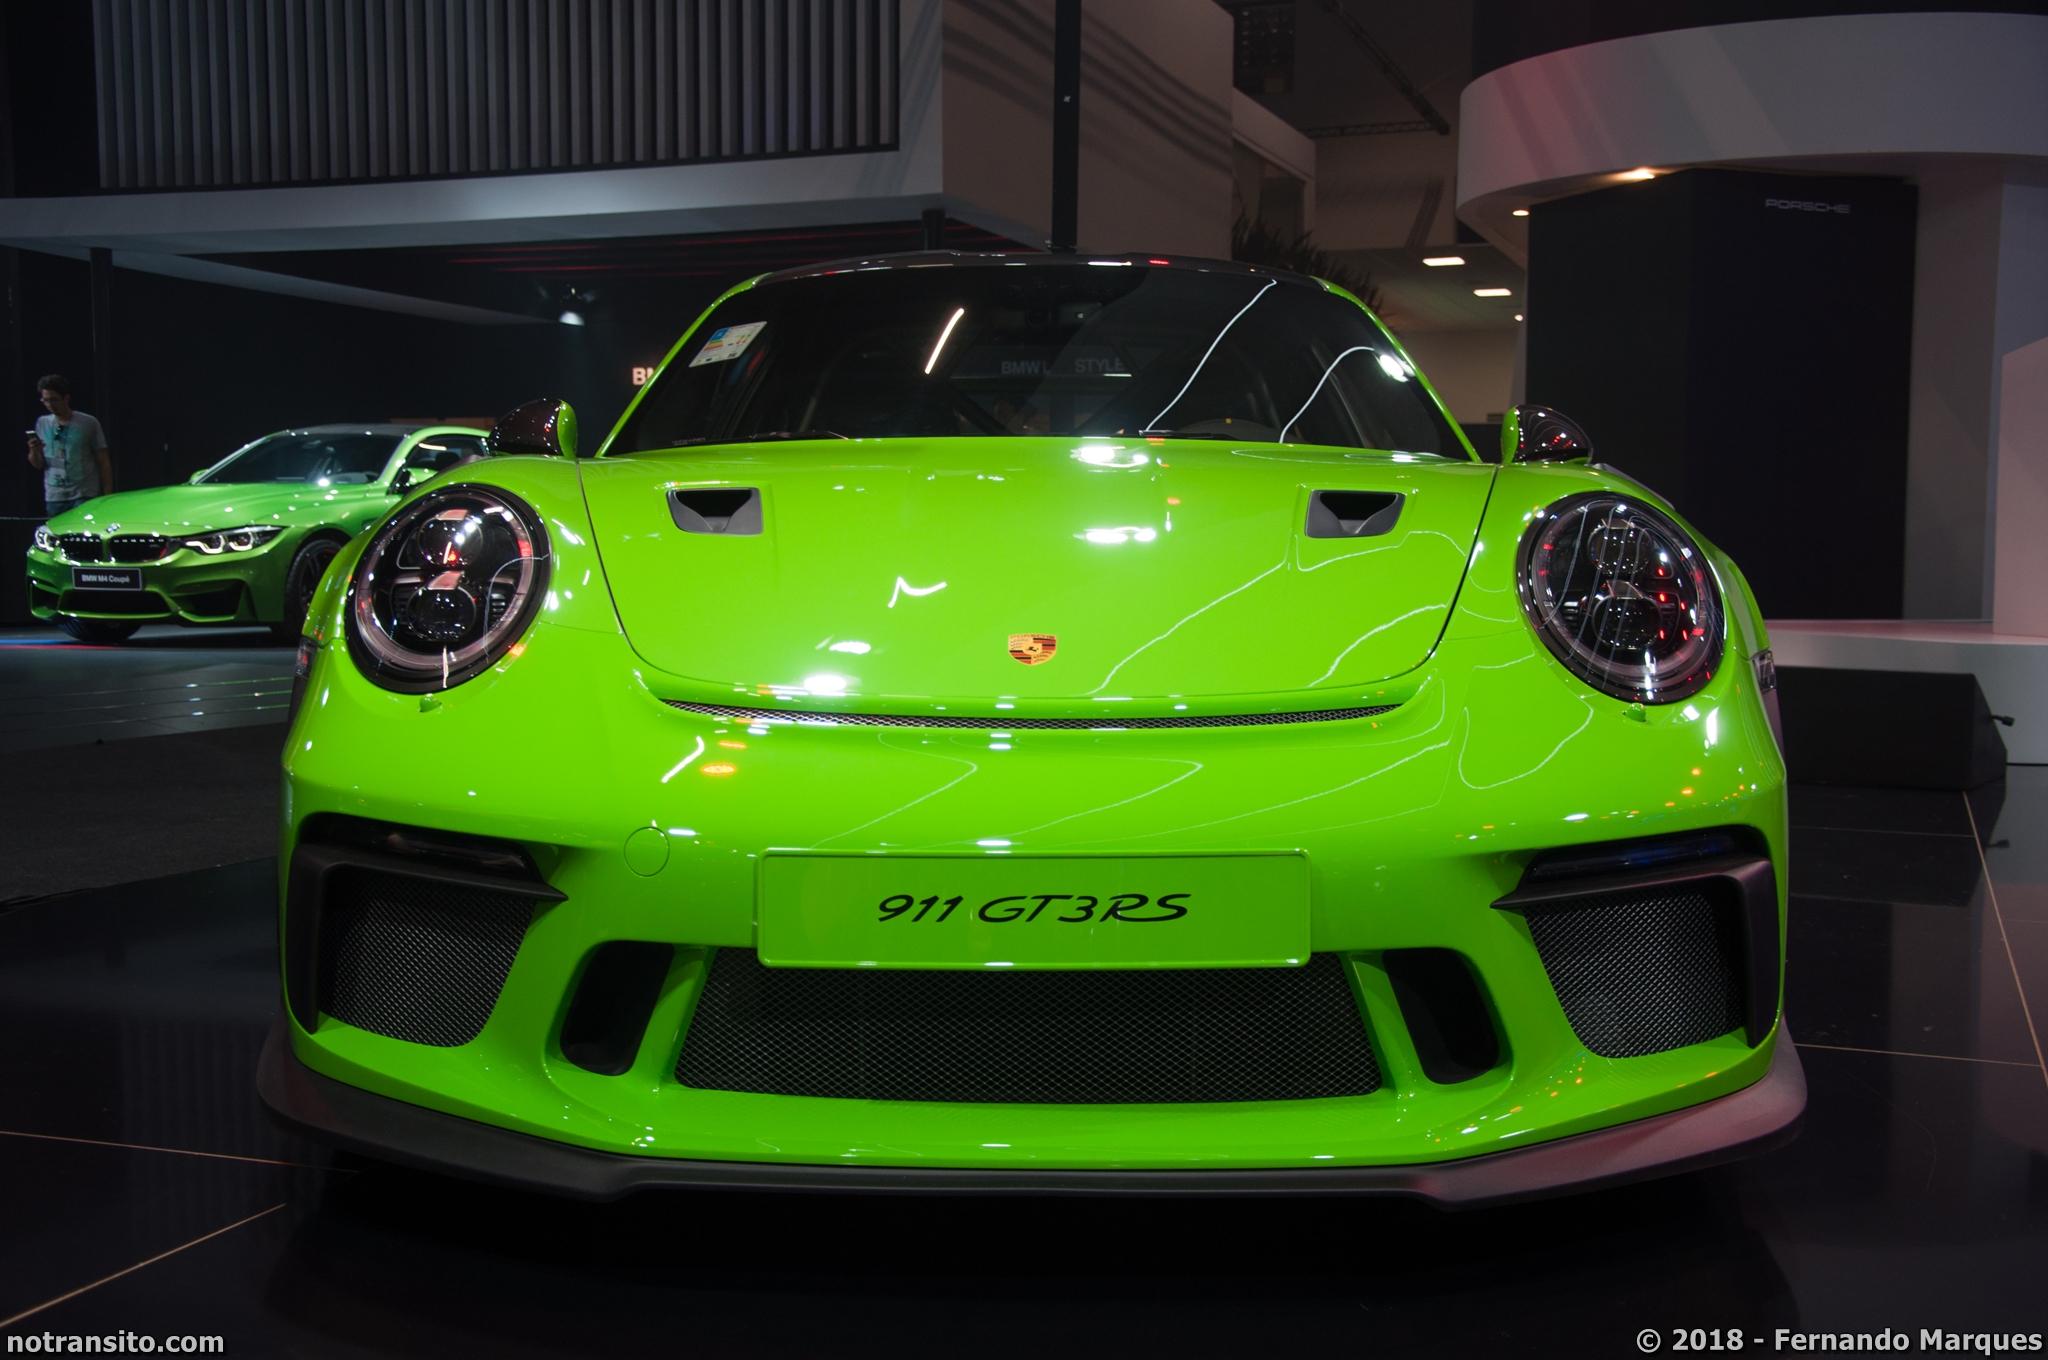 Salão2018-Porsche911GT3RS-01